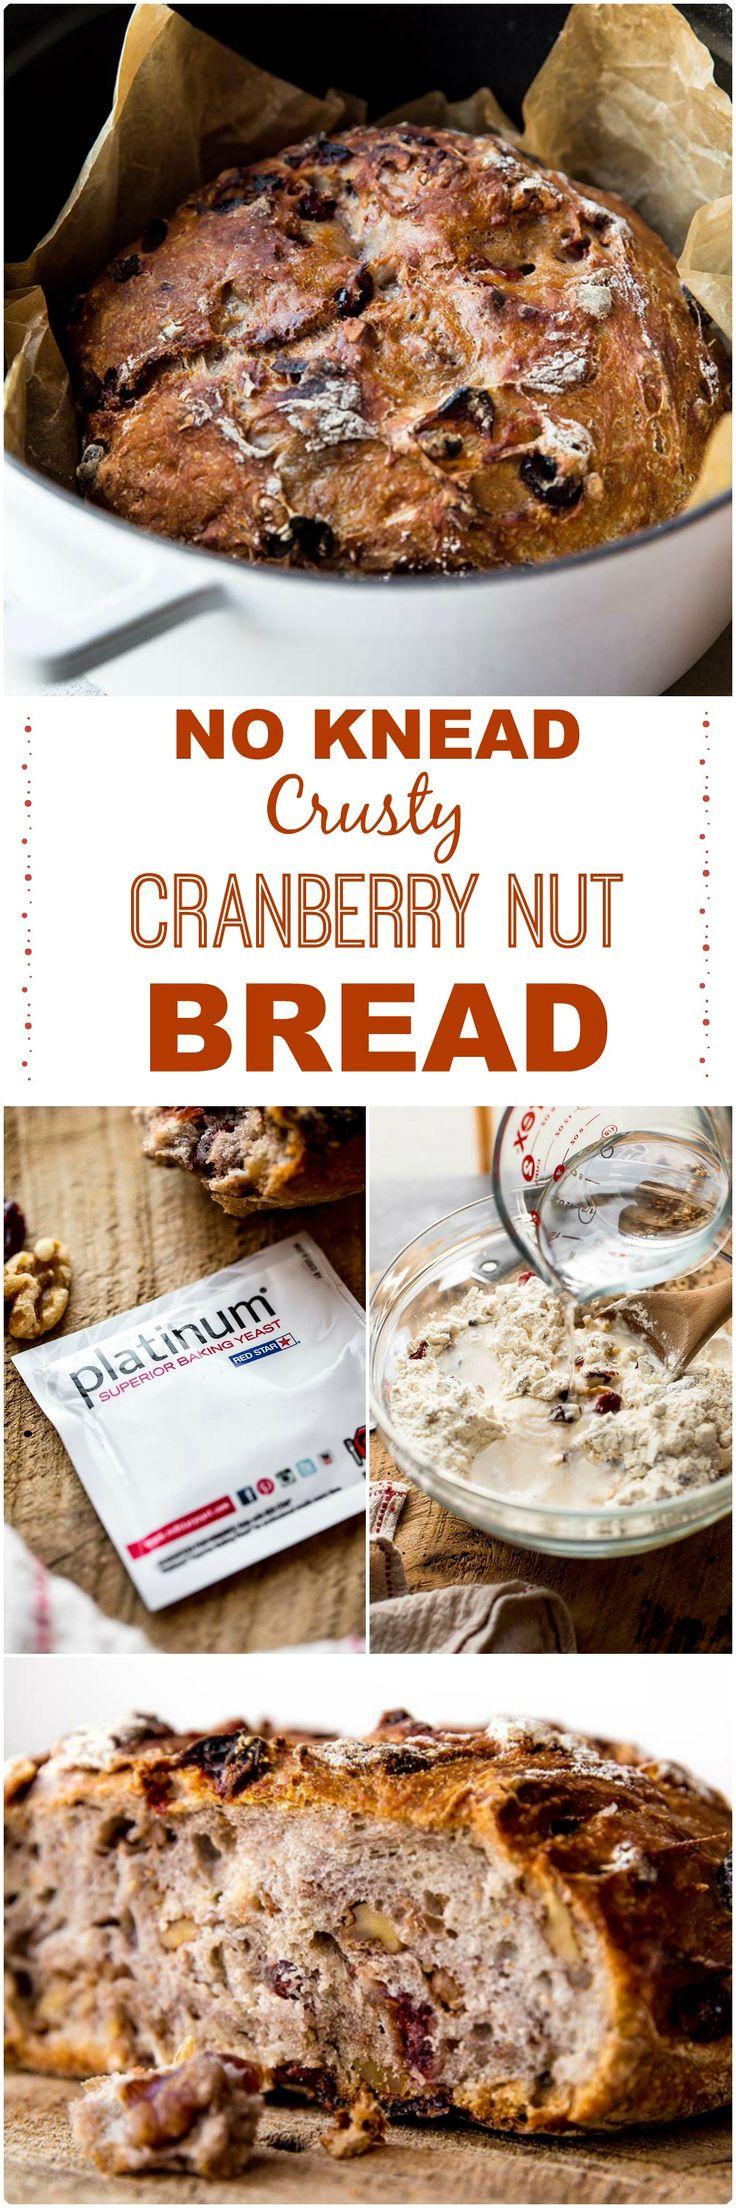 No Knead Crusty Cranberry Nut Bread